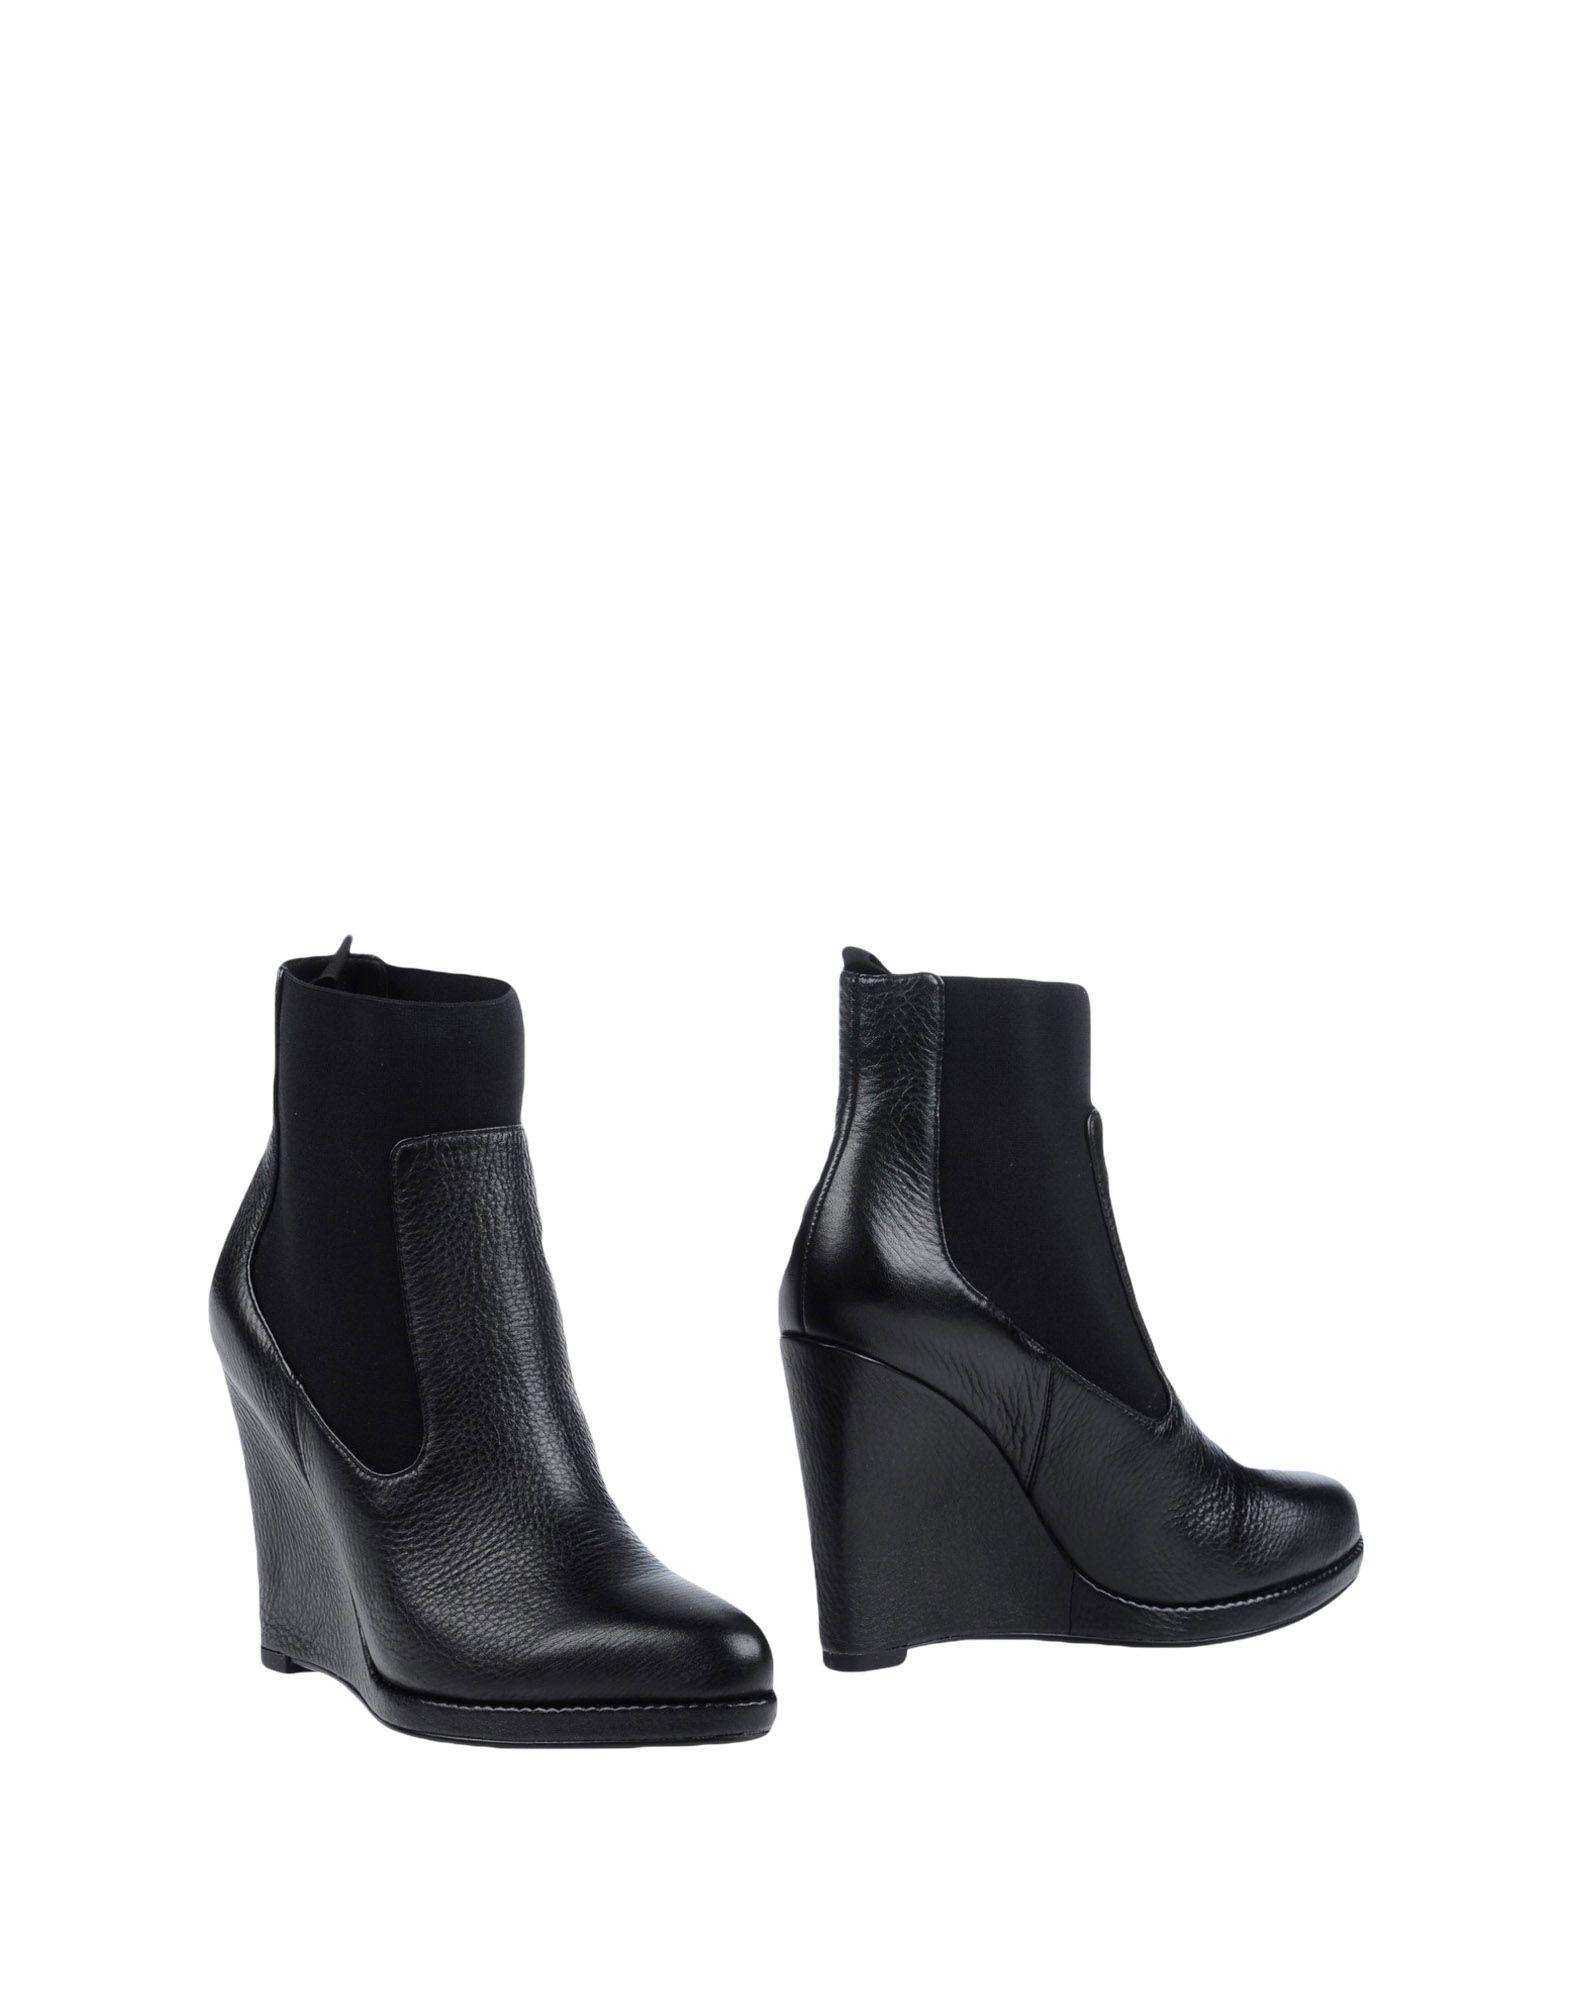 Chelsea Boots Lola Donna Cruz Donna Lola - 11264393LR fdeea1